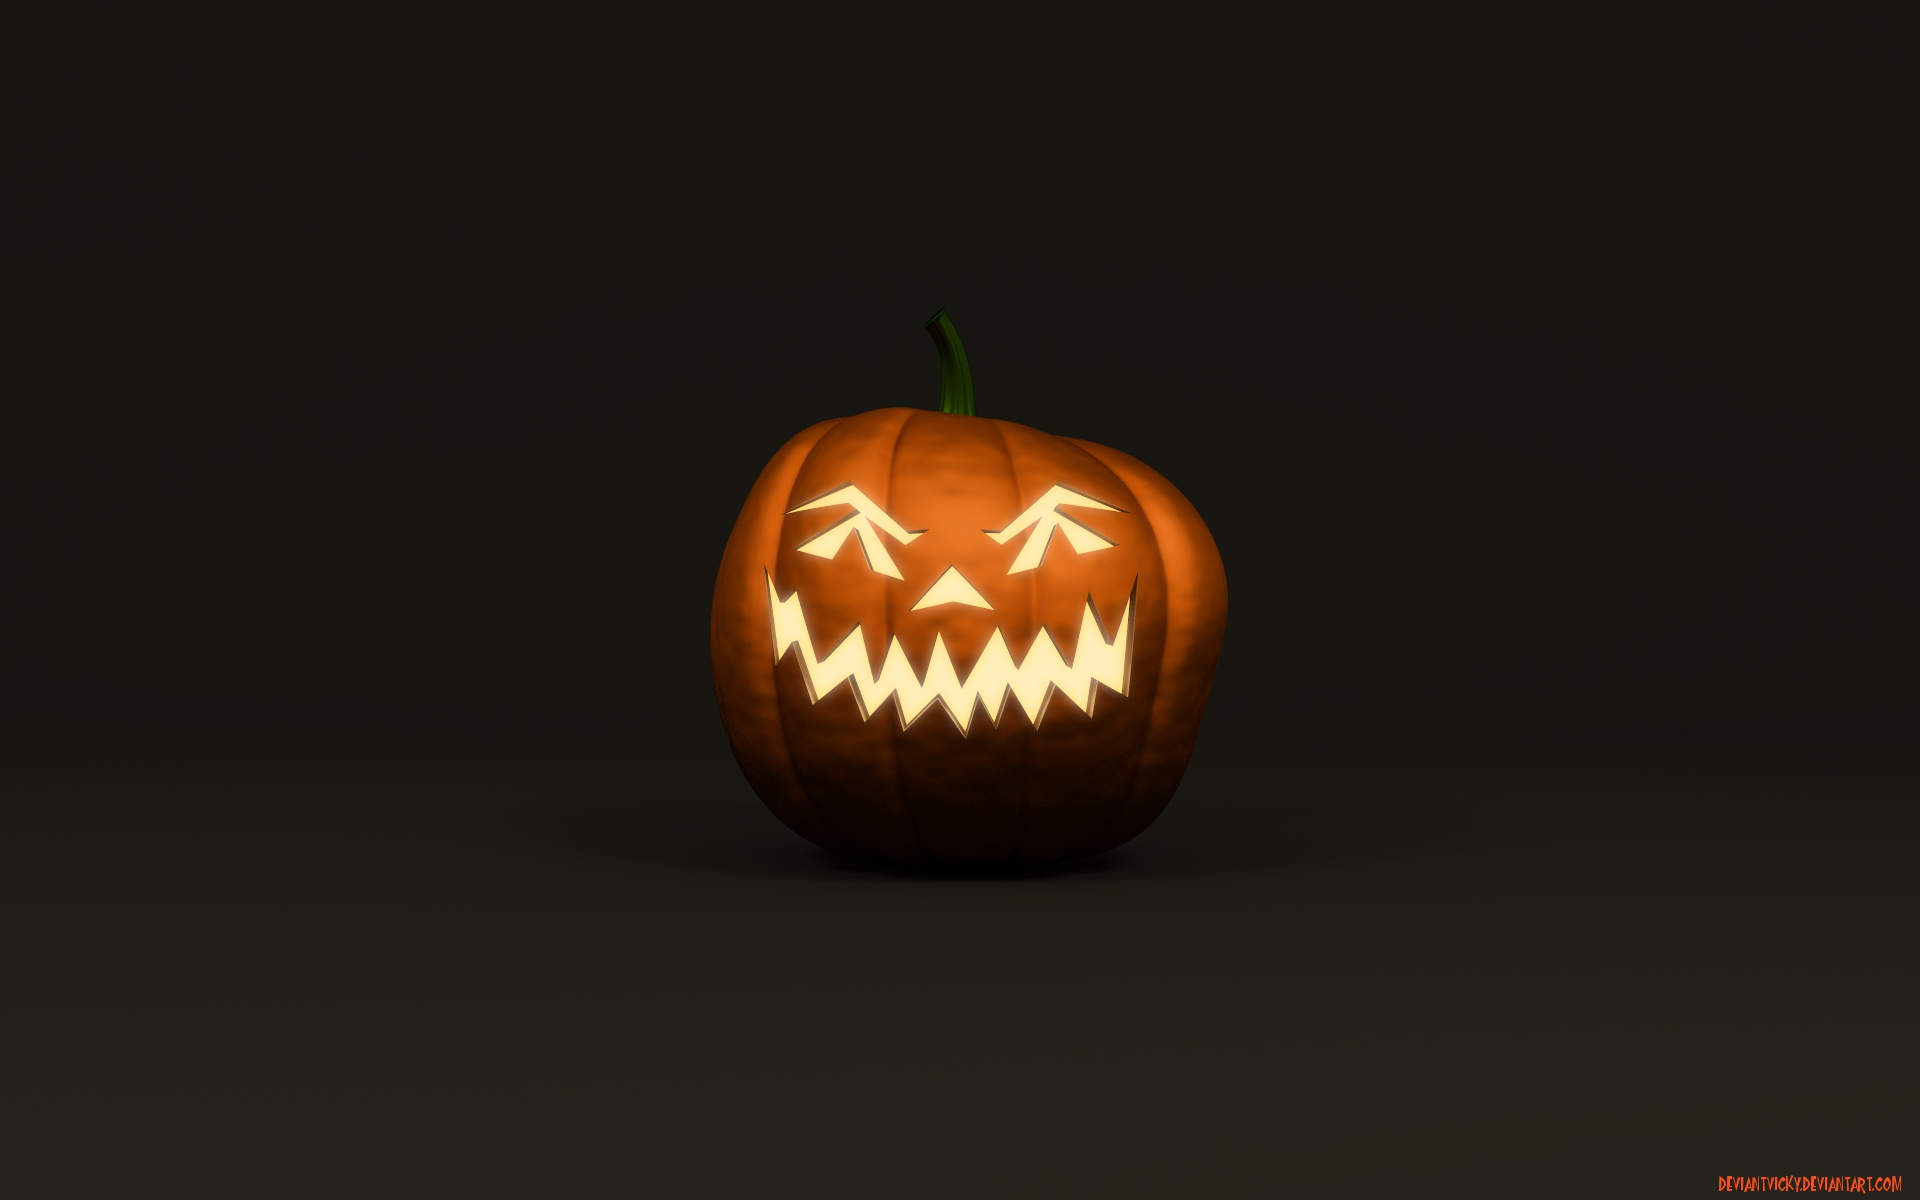 Hd Wallpapers Halloween Pumpkin Carving 2592 X 1944 1580 Kb Jpeg HD 1920x1200